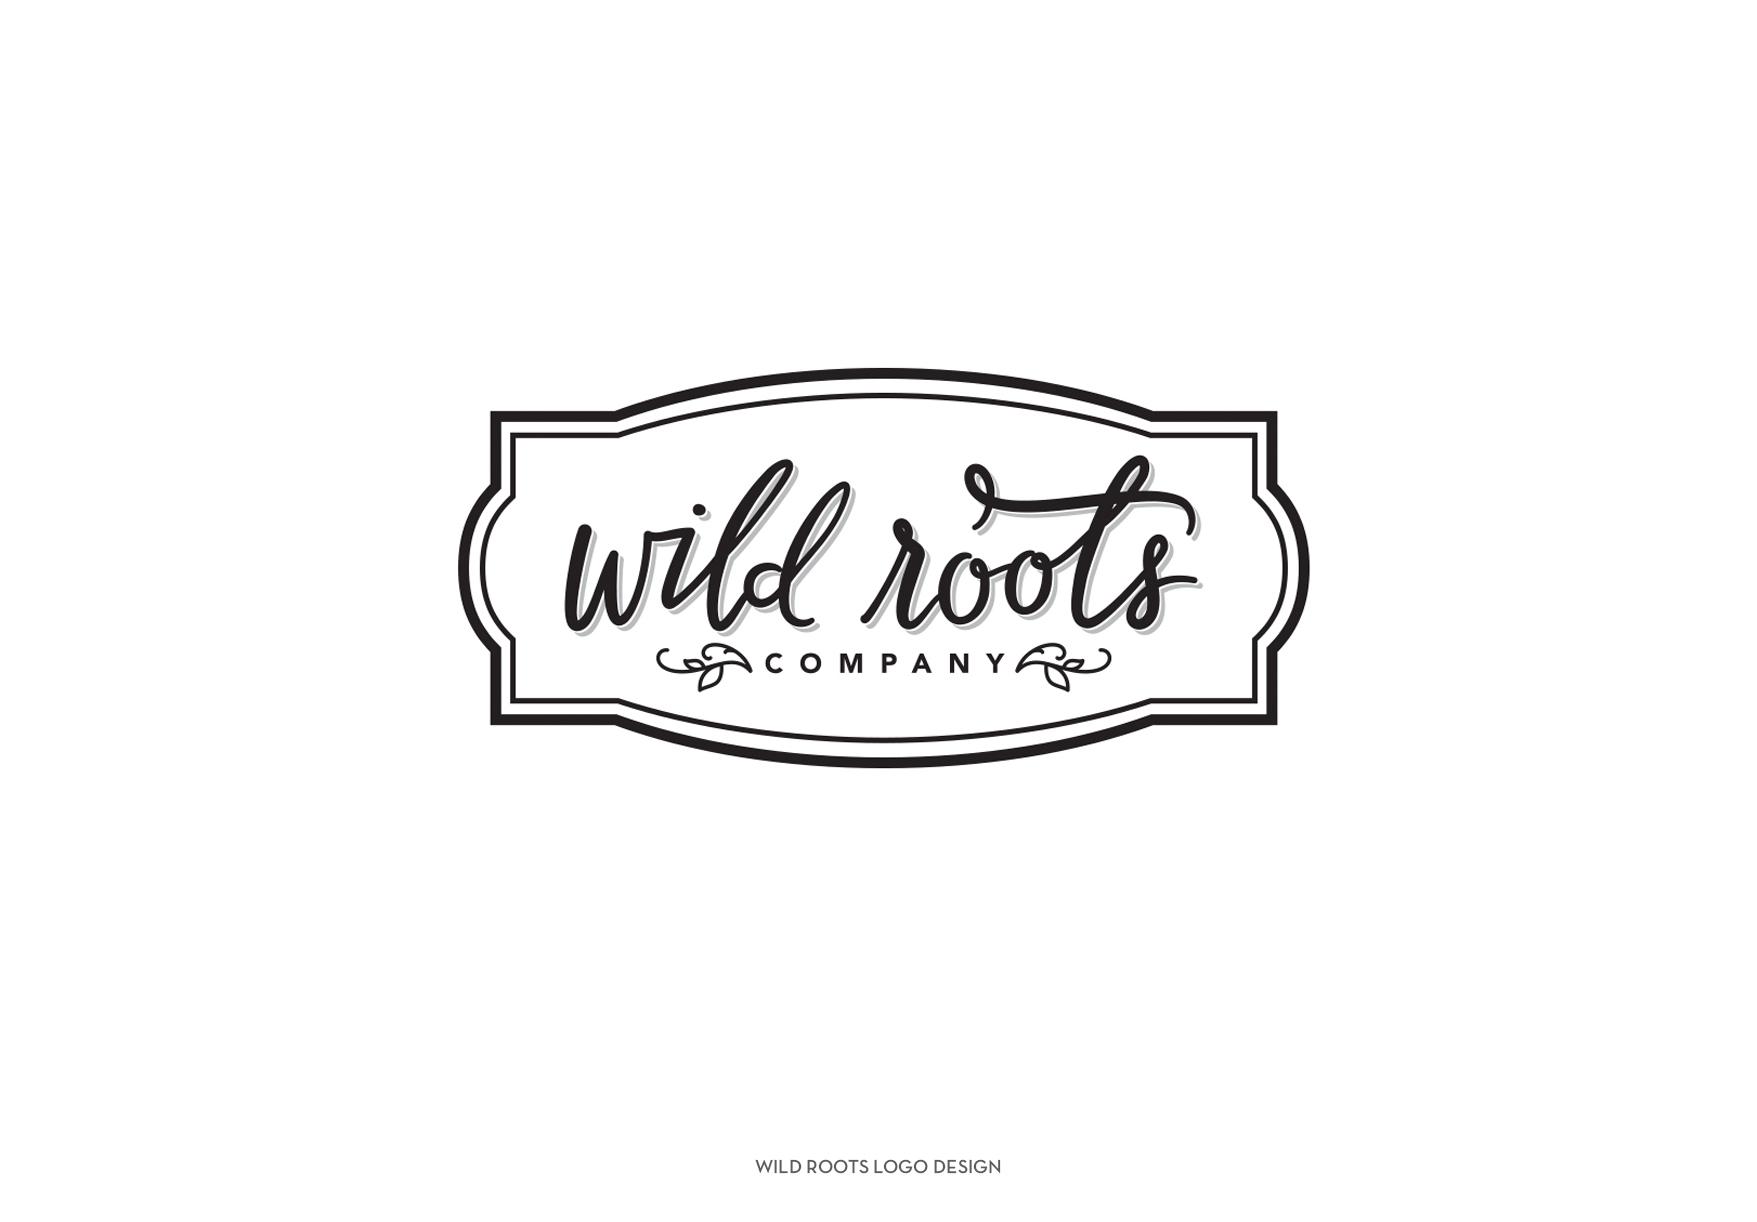 WildRoots1.jpg